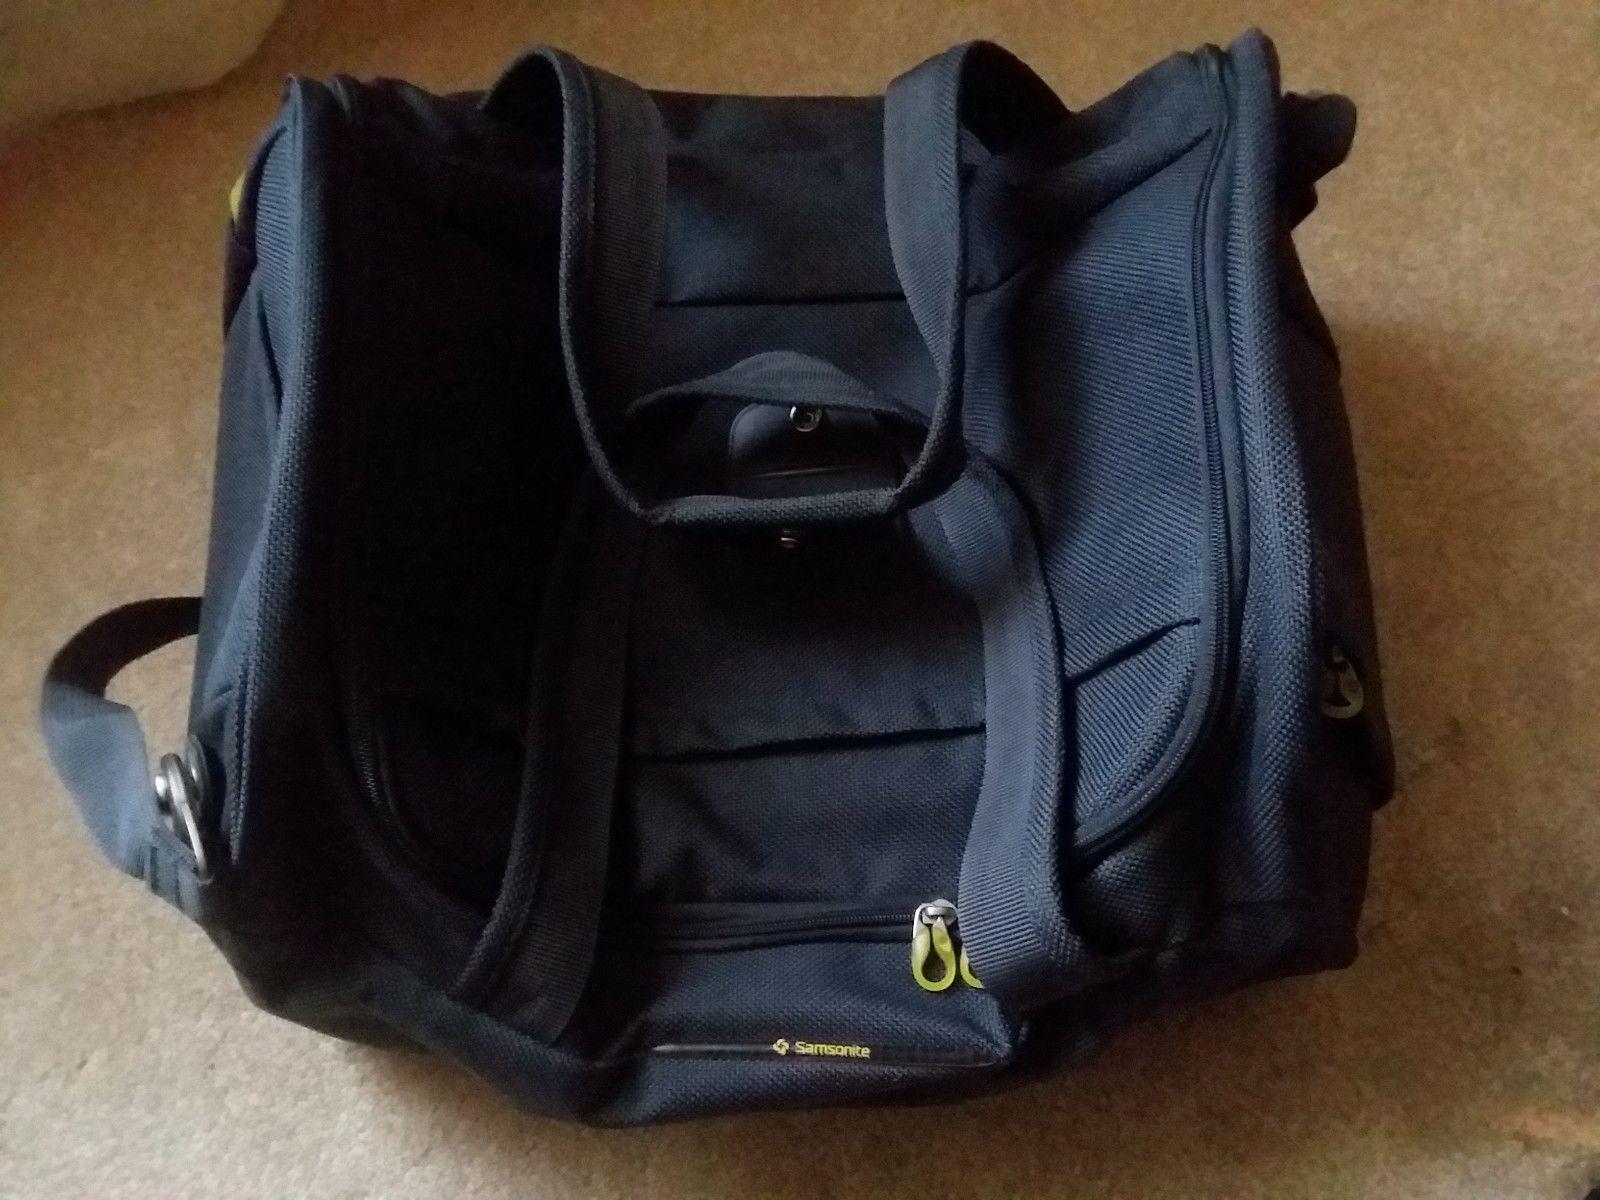 Samsonite Gray Yellow Travel Case Duffel Luggage